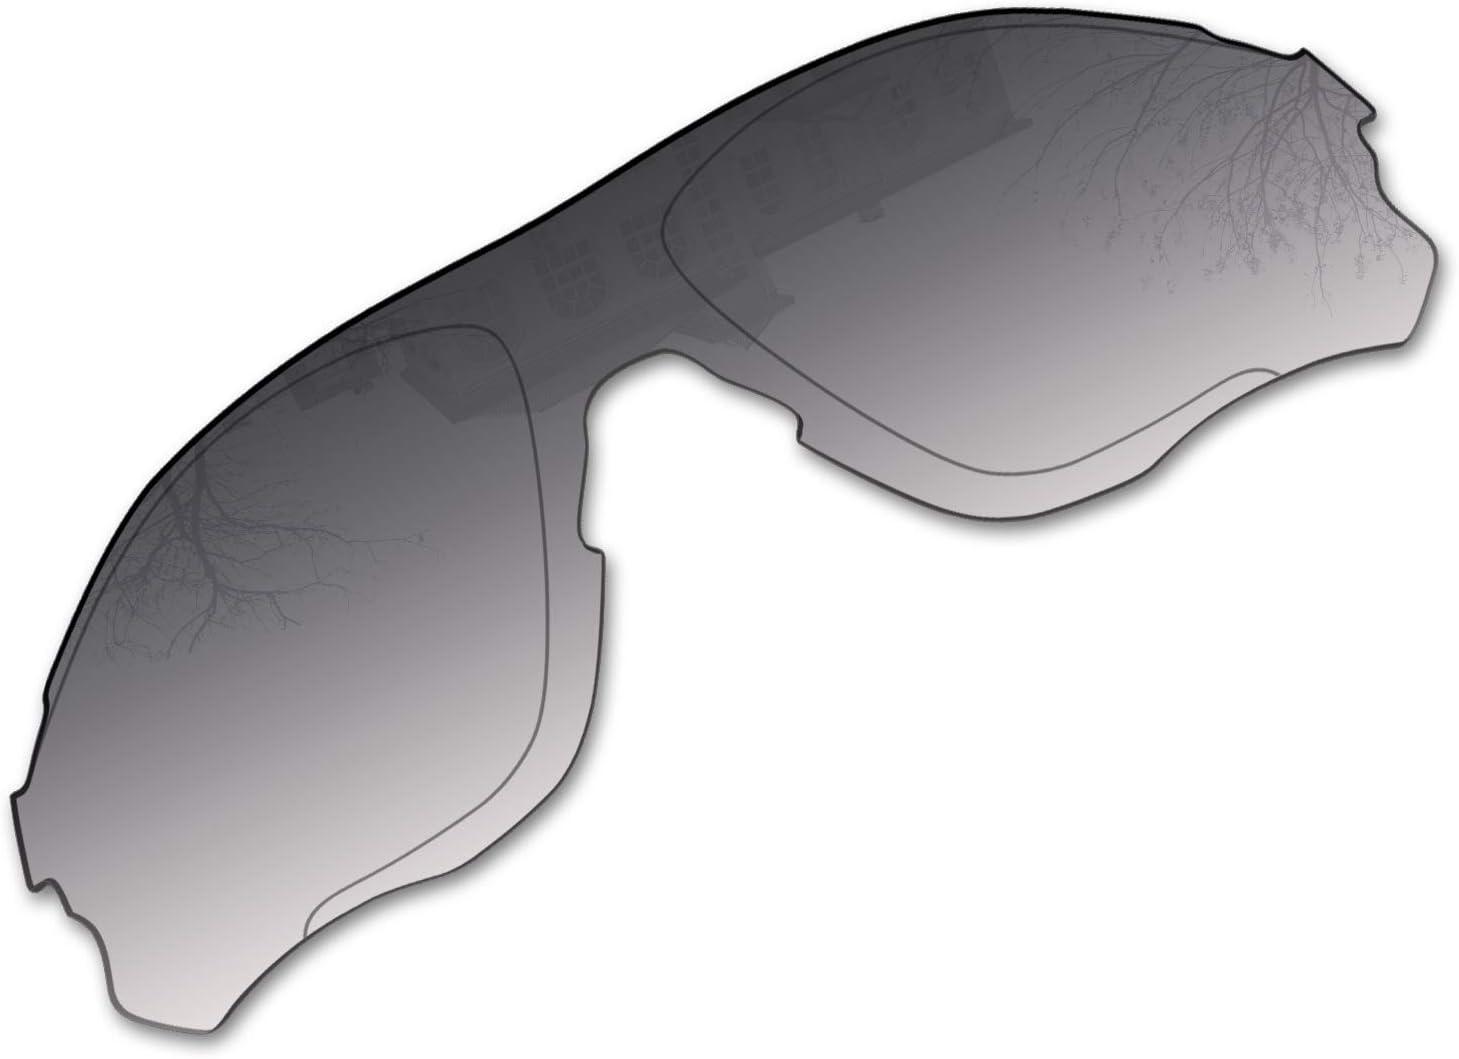 Rango Canoa Costrizione  Amazon.com: Millersawp EVZero Path OO9308 Replacement Rubber Kits  Compatible with Oakley Sunglass-Black: Sports & Outdoors